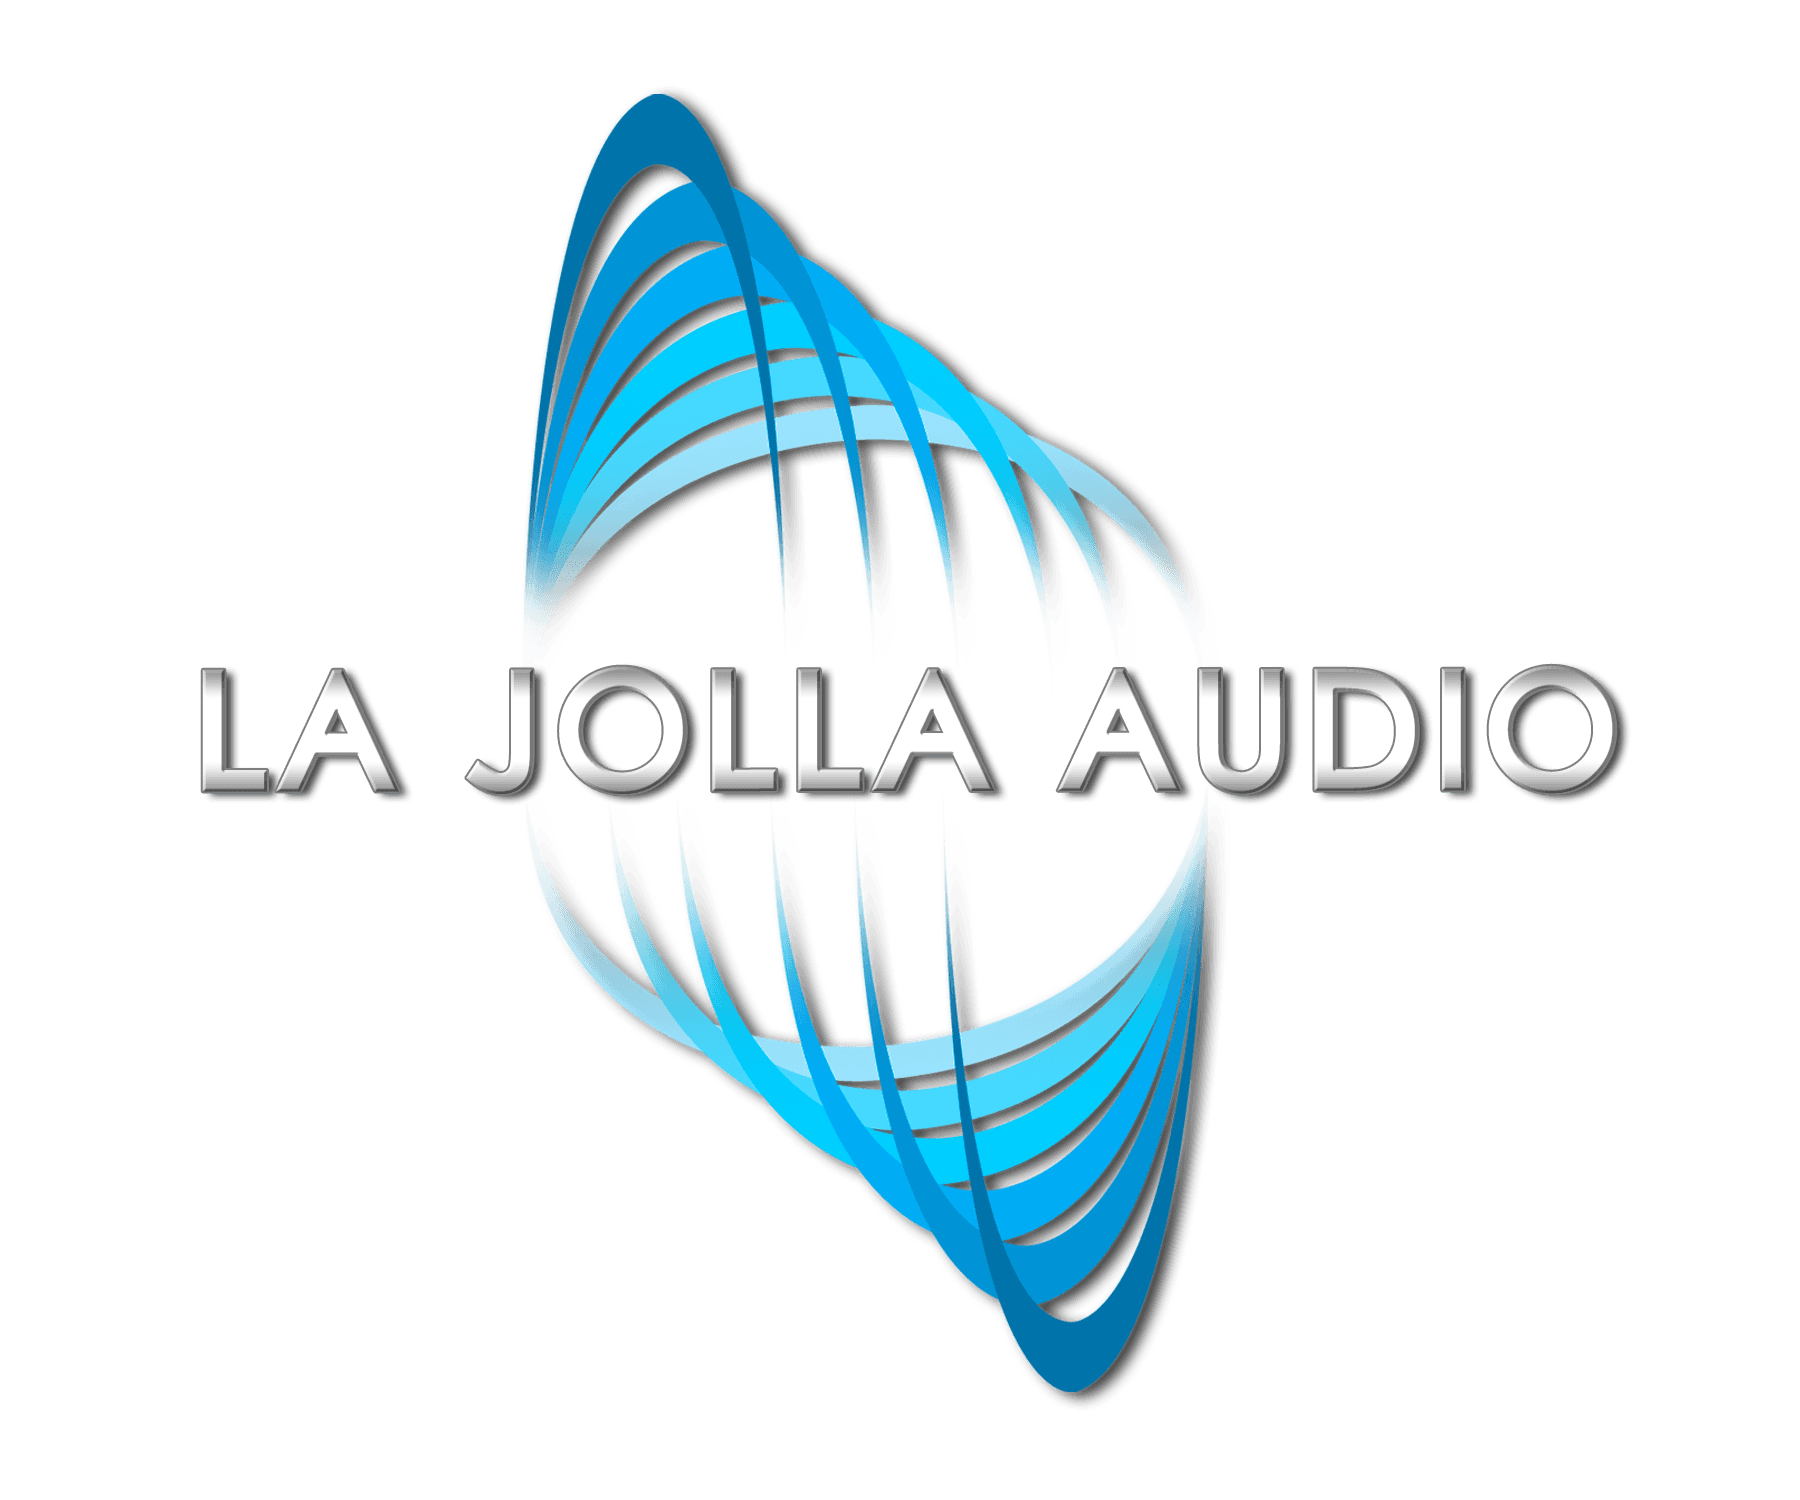 La Jolla Audio - Logo